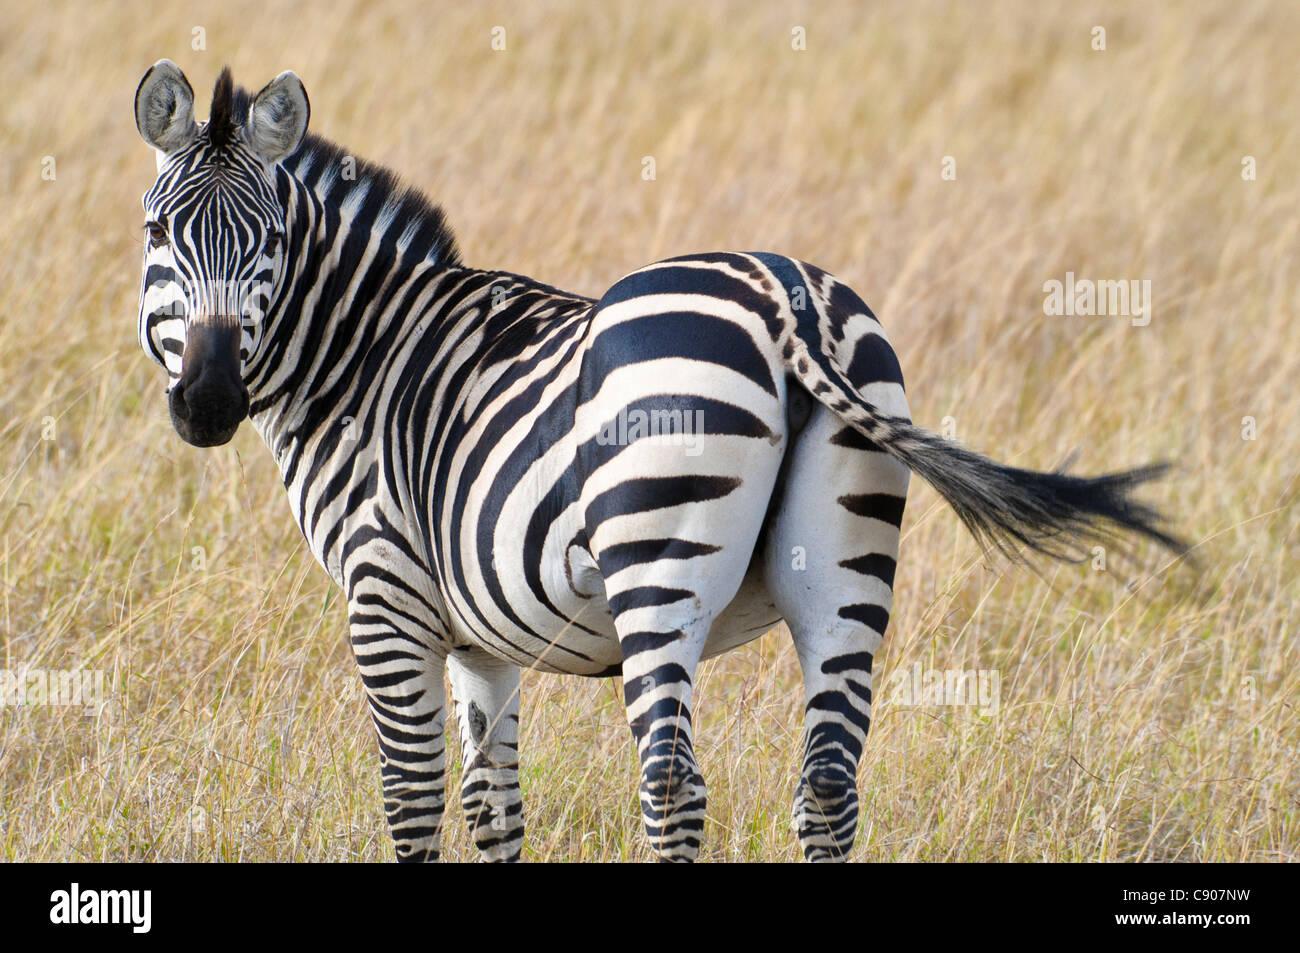 Vue arrière du le zèbre de Burchell, Equus burchellii guagga, Masai Mara National Reserve, Kenya, Africa Photo Stock